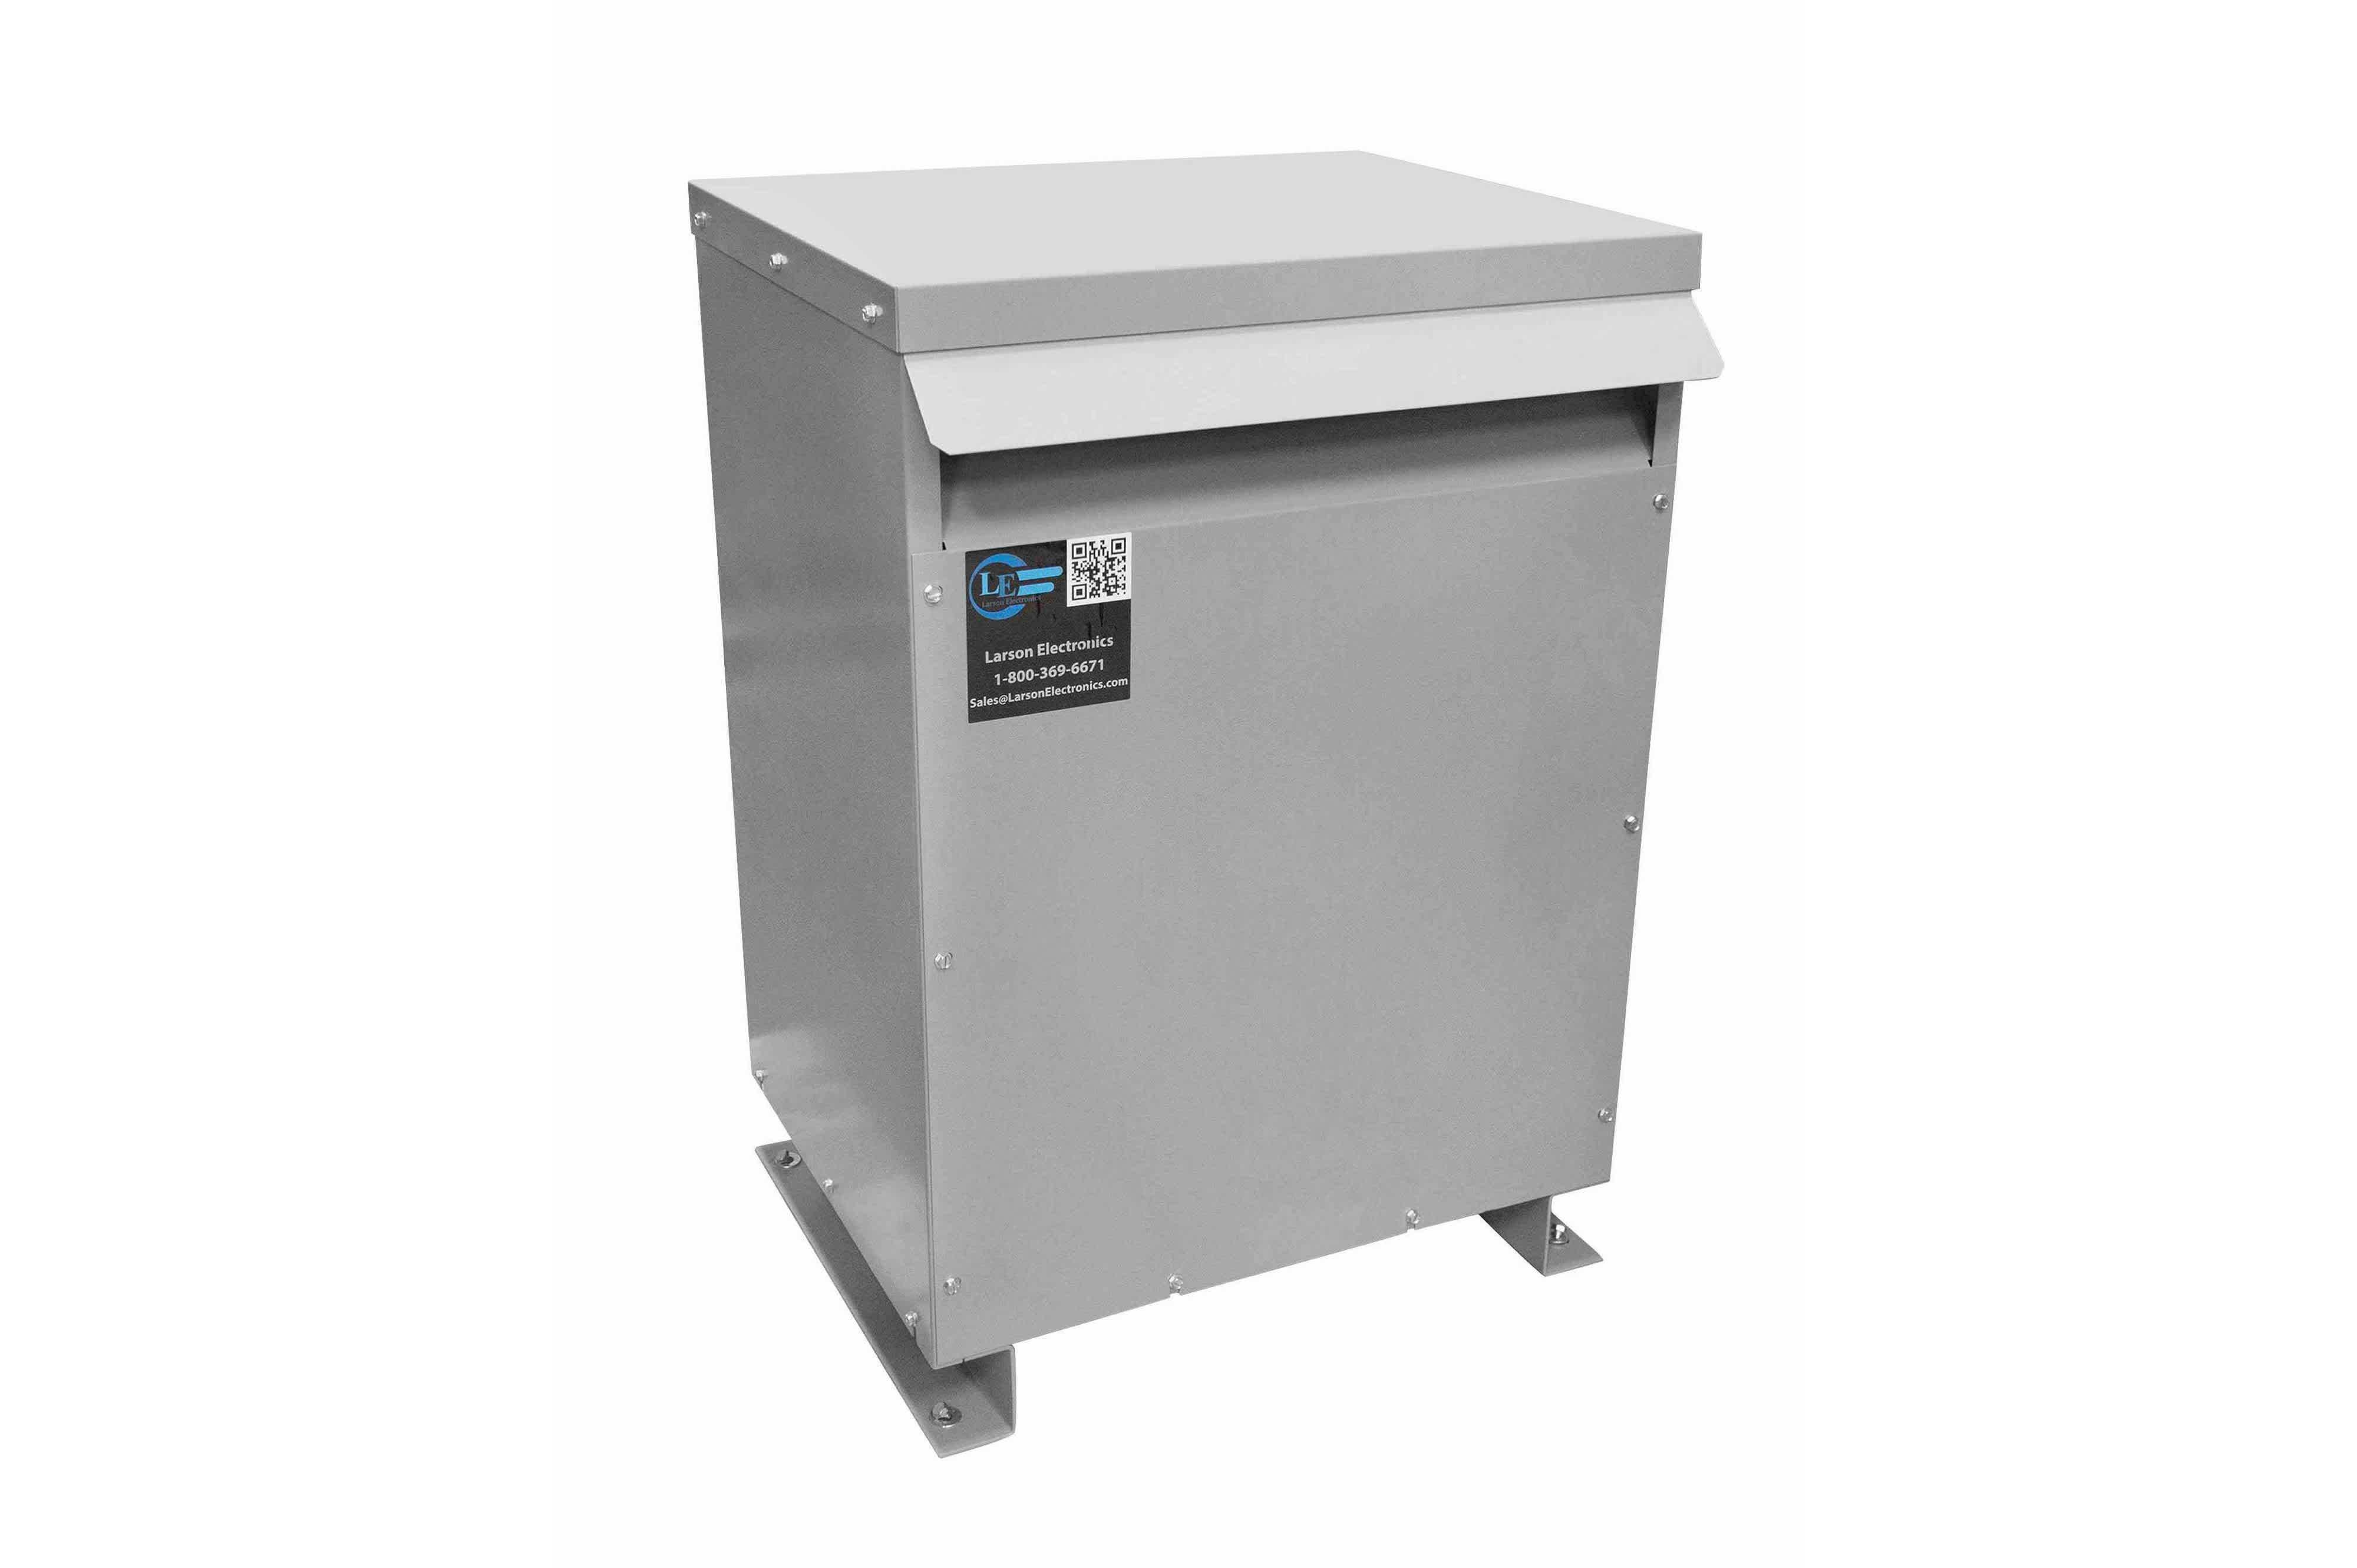 100 kVA 3PH Isolation Transformer, 600V Wye Primary, 415Y/240 Wye-N Secondary, N3R, Ventilated, 60 Hz